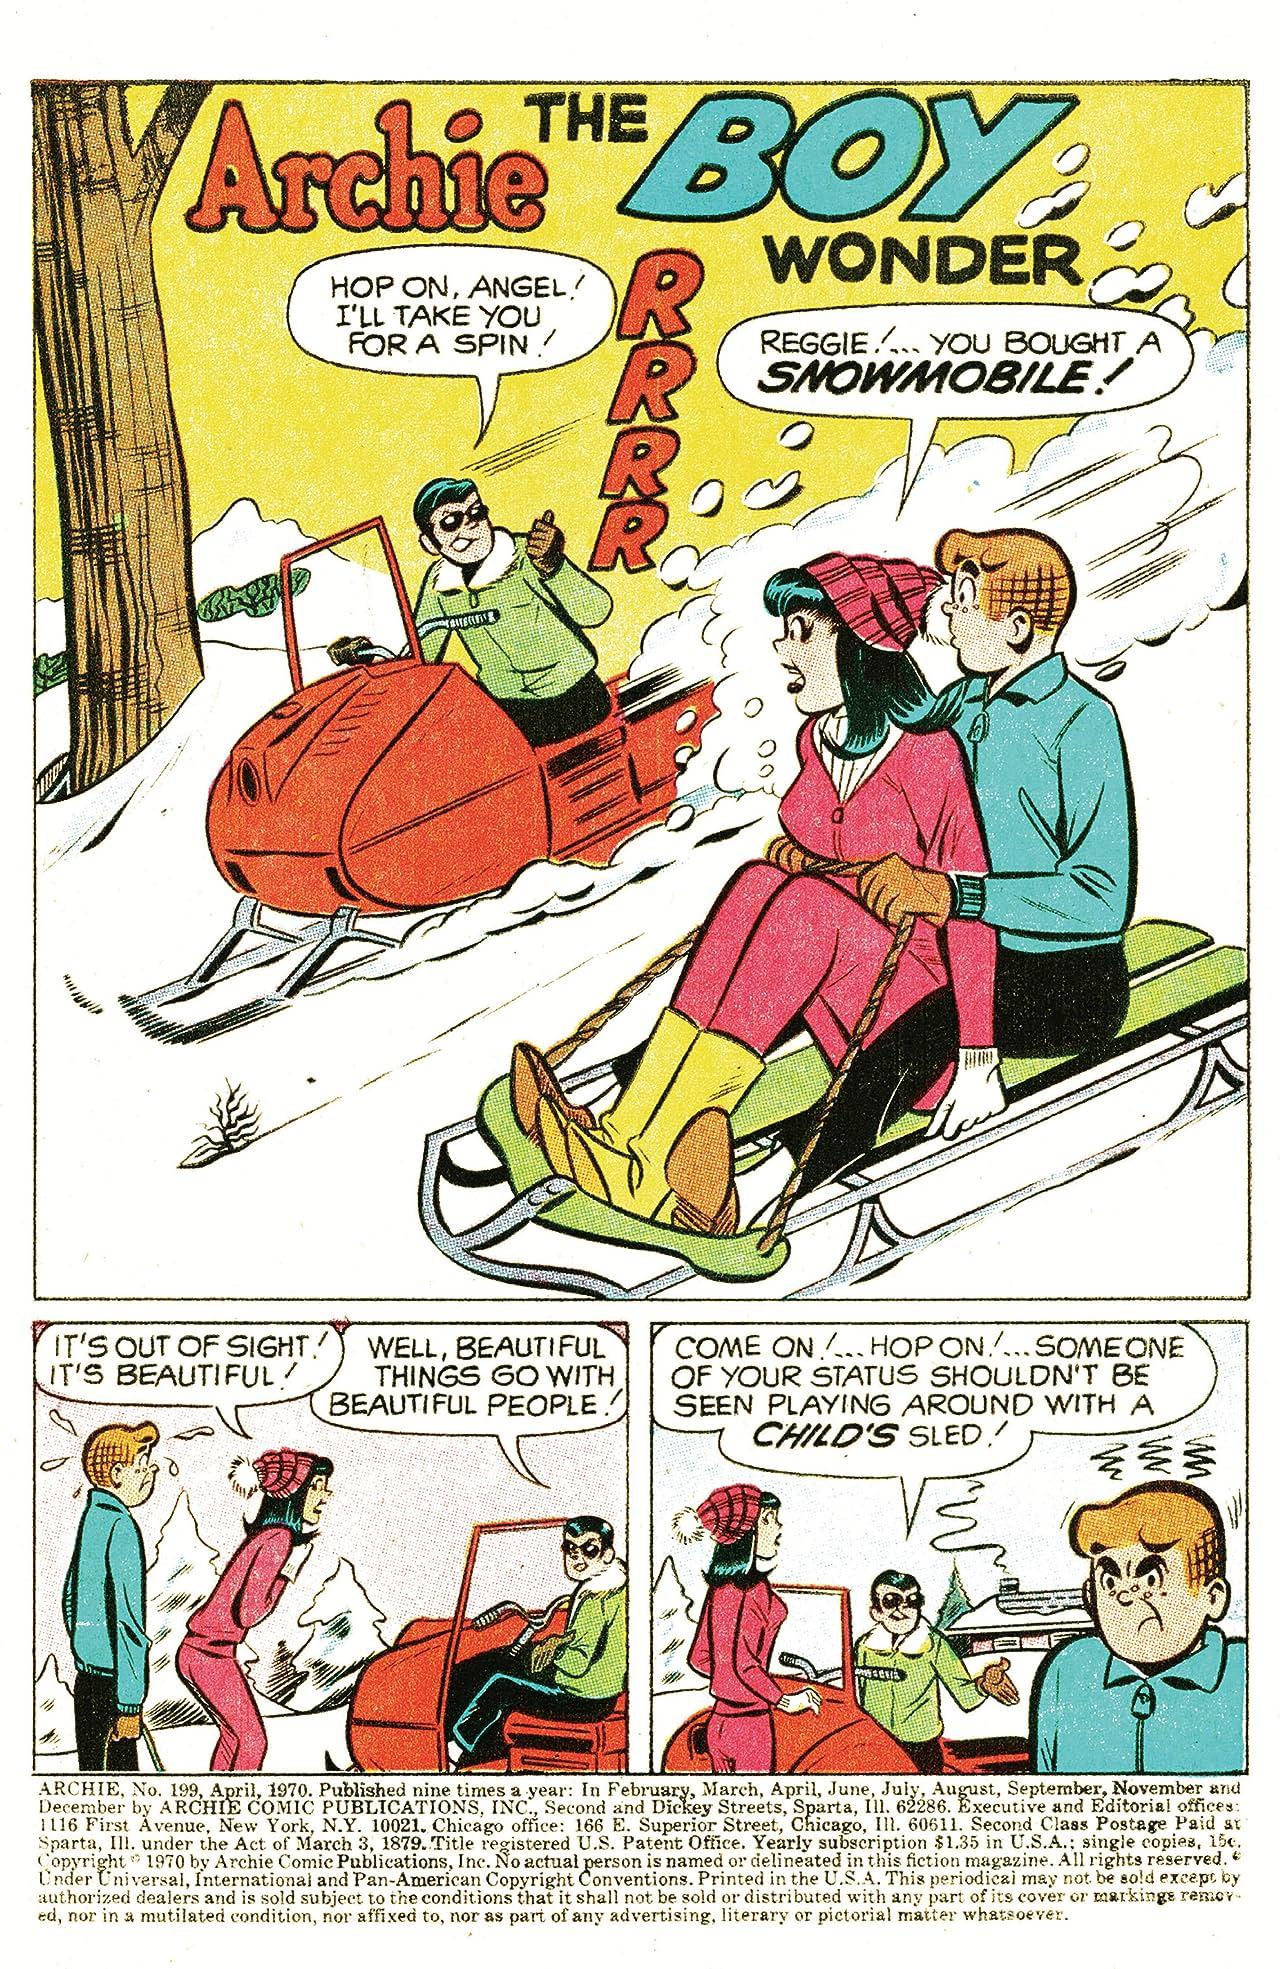 Archie #199